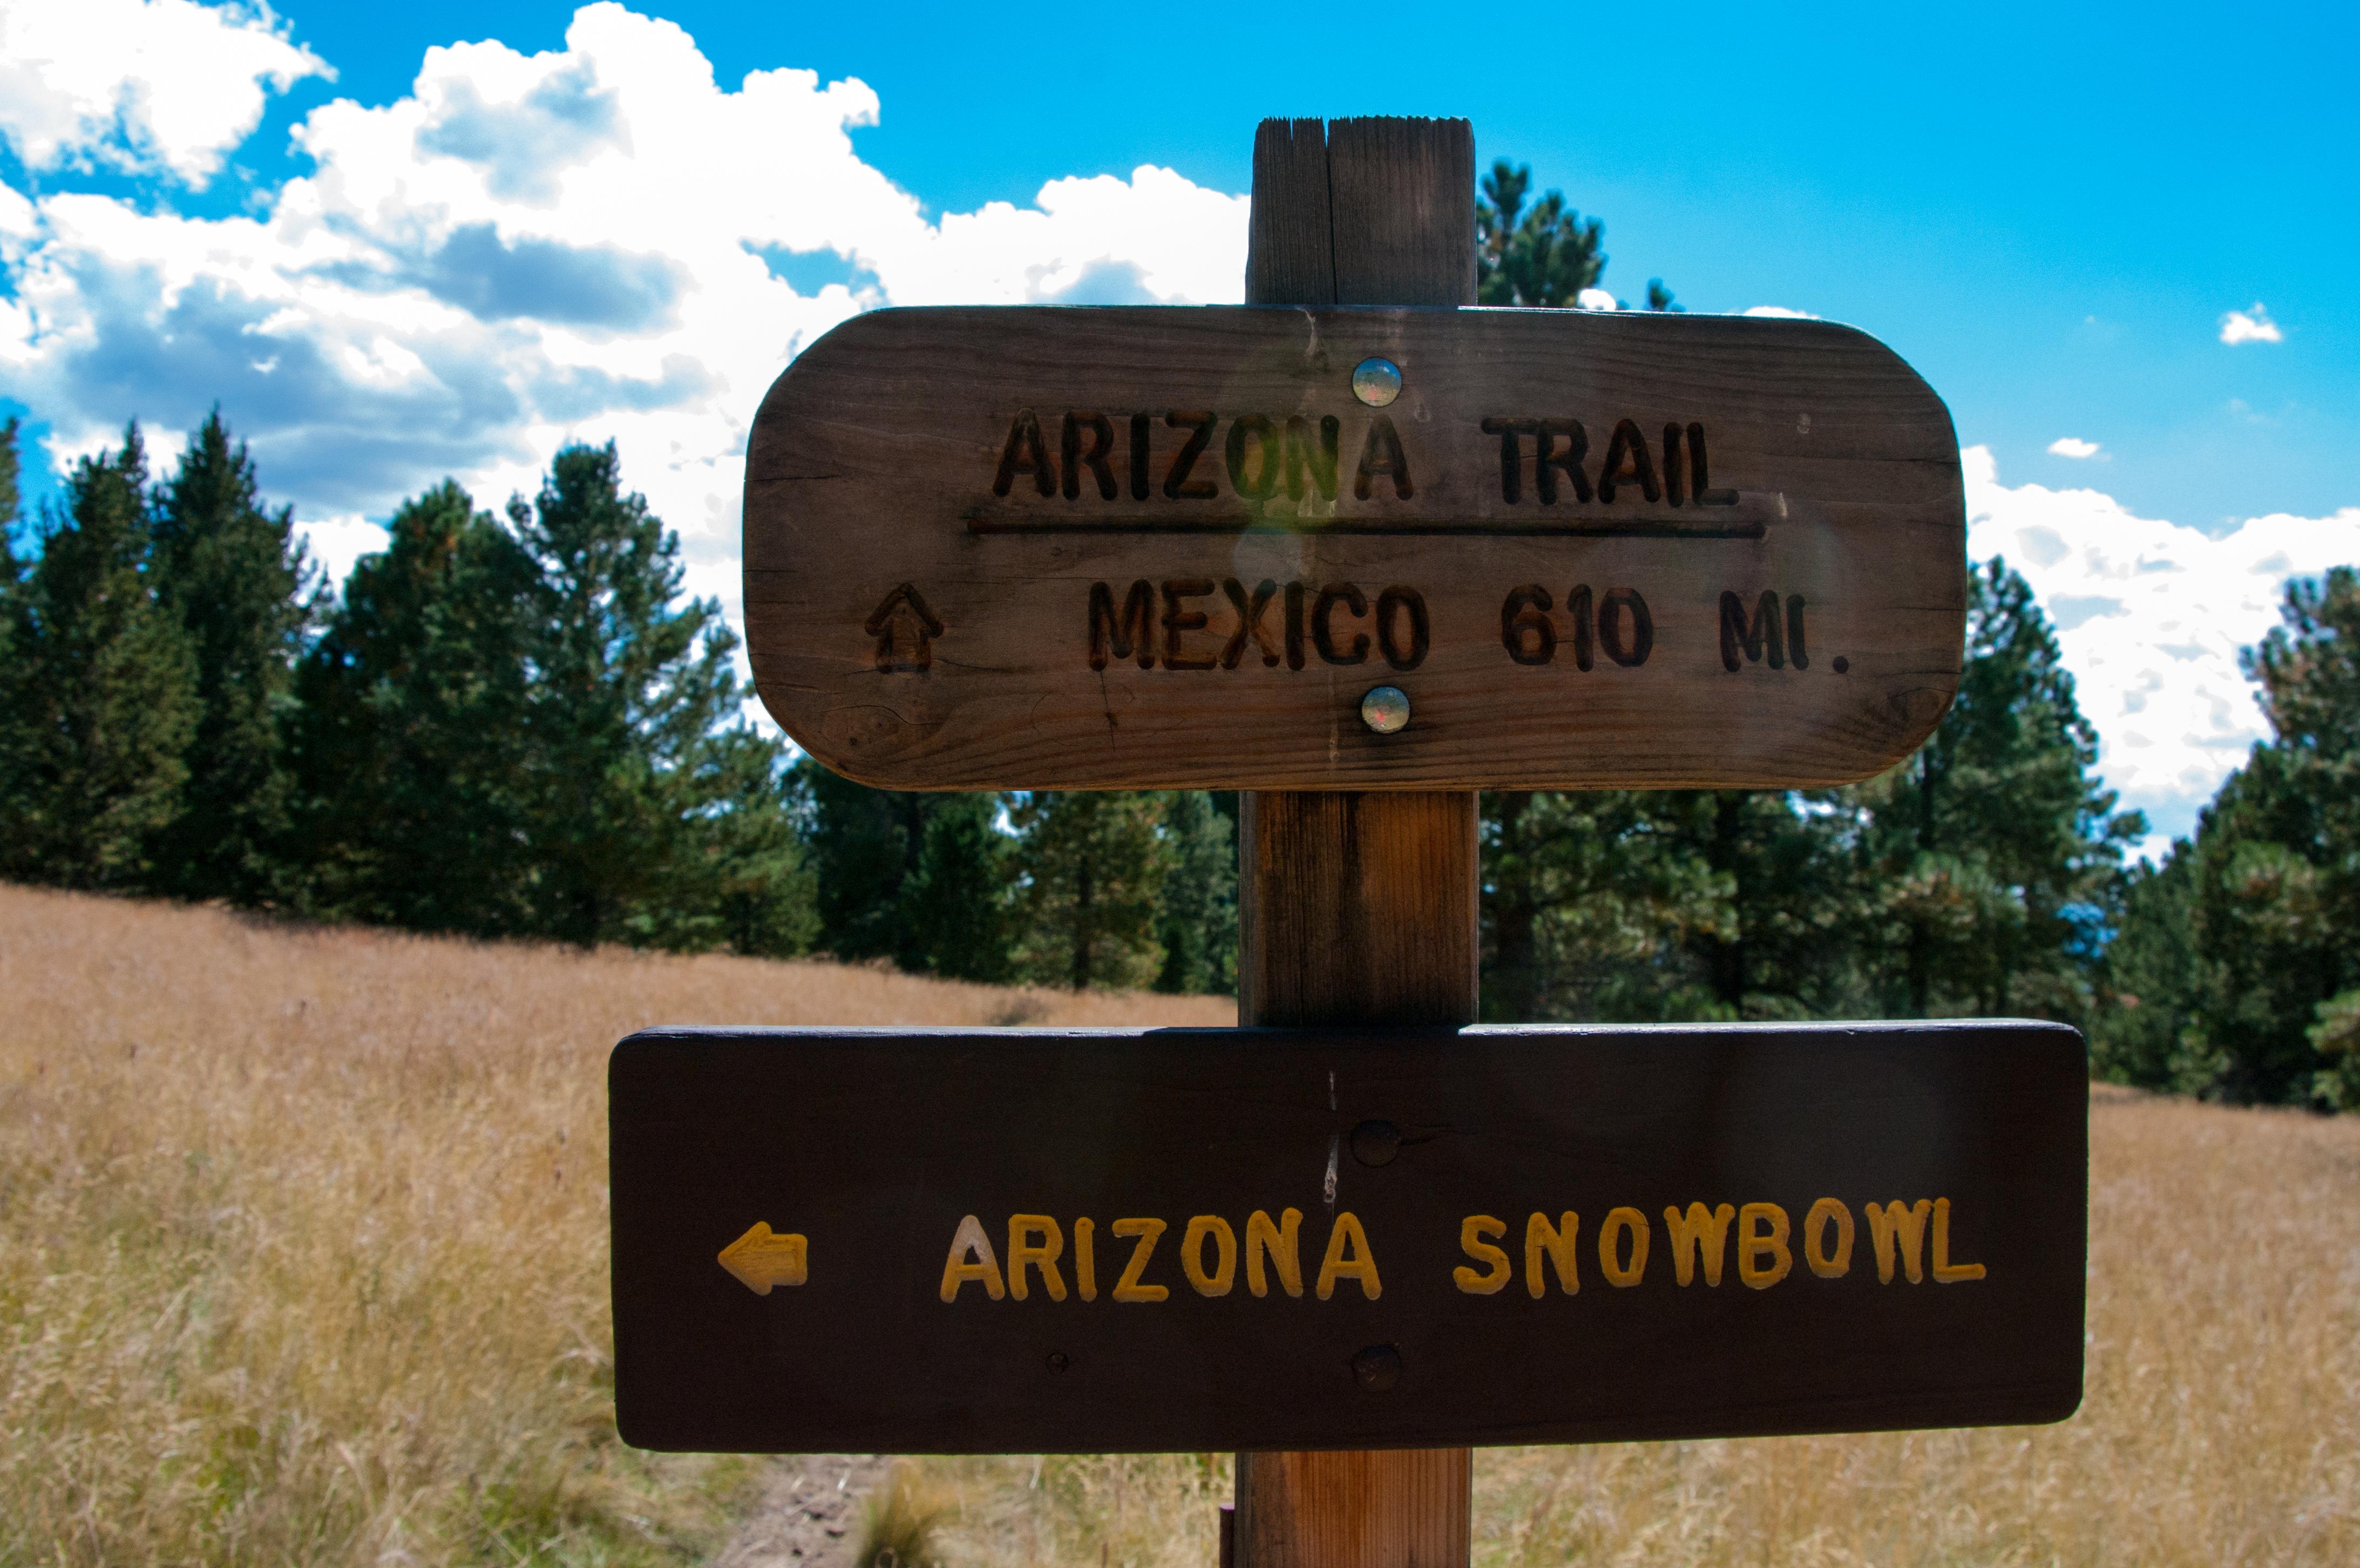 Arizona Trail-Aspen Loop Trail Junction, Arizona, National Forest, United states, Trail, HQ Photo